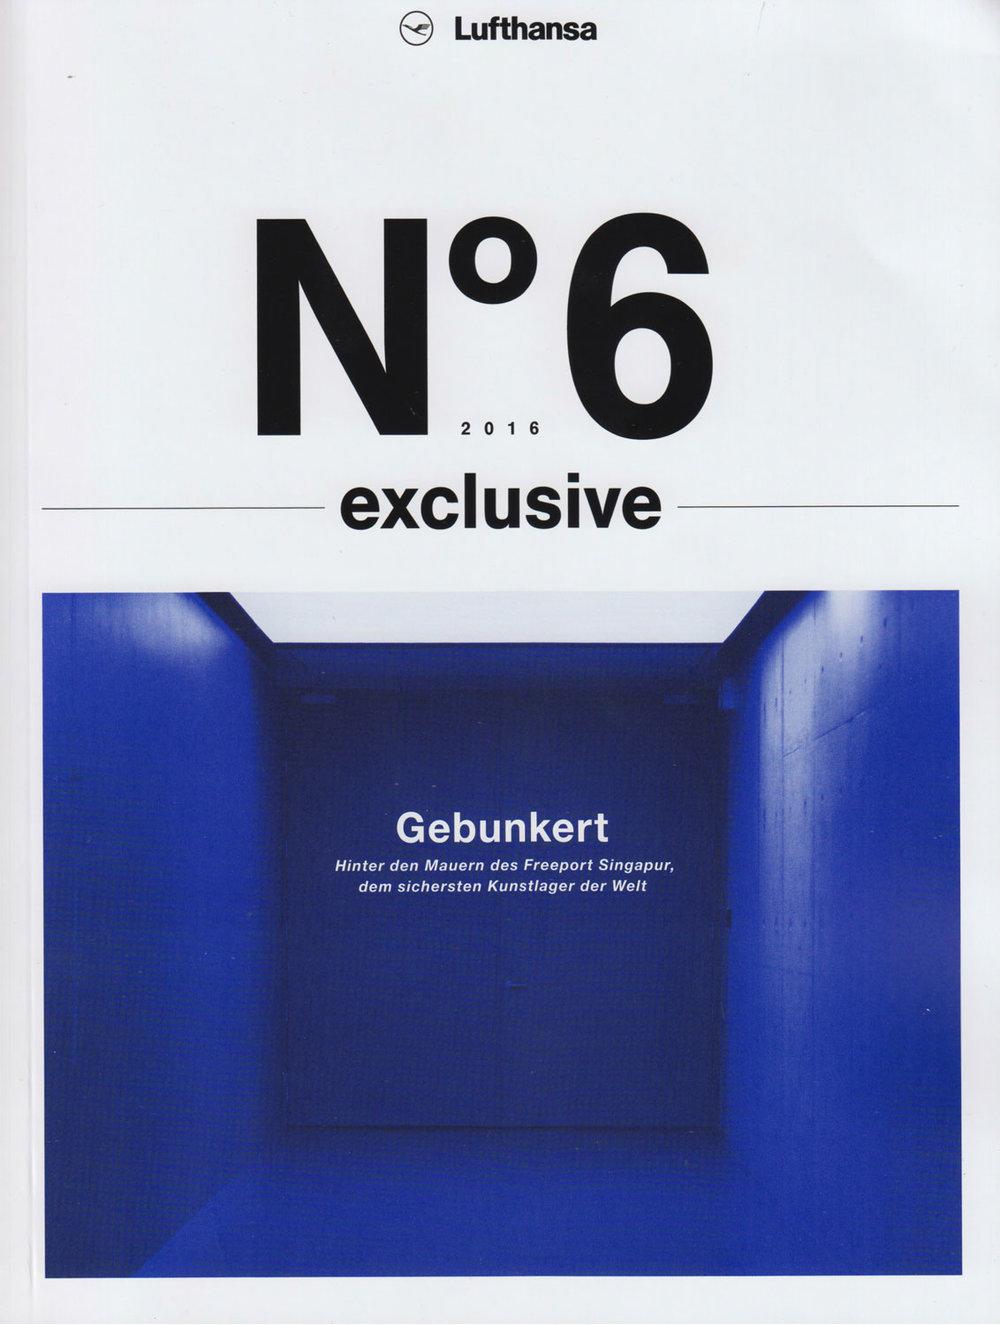 MI_Lufthansa_Exclusive_Print_01.jpg